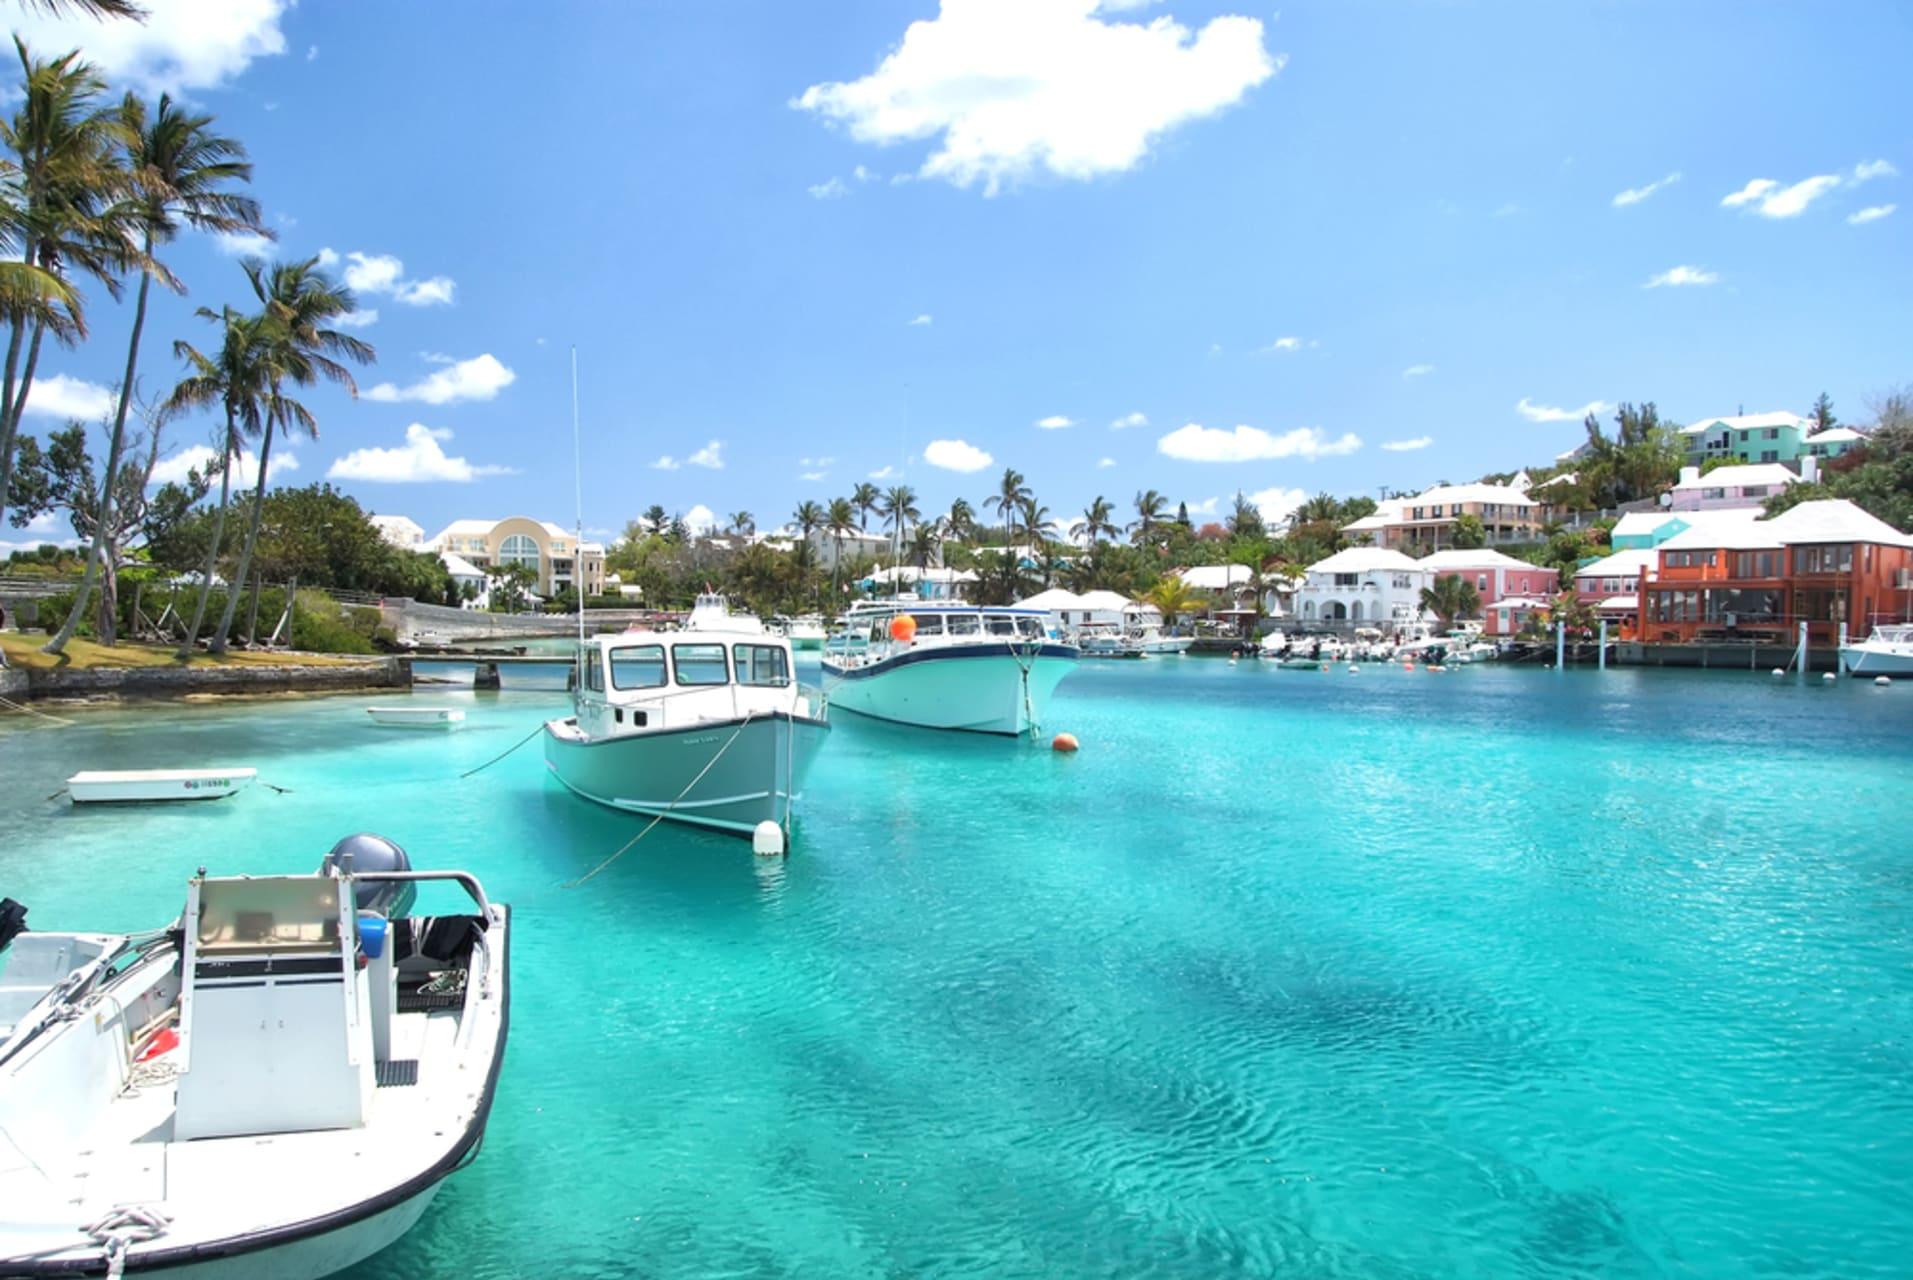 Bermuda - Private Boat tour with Tony & Friends